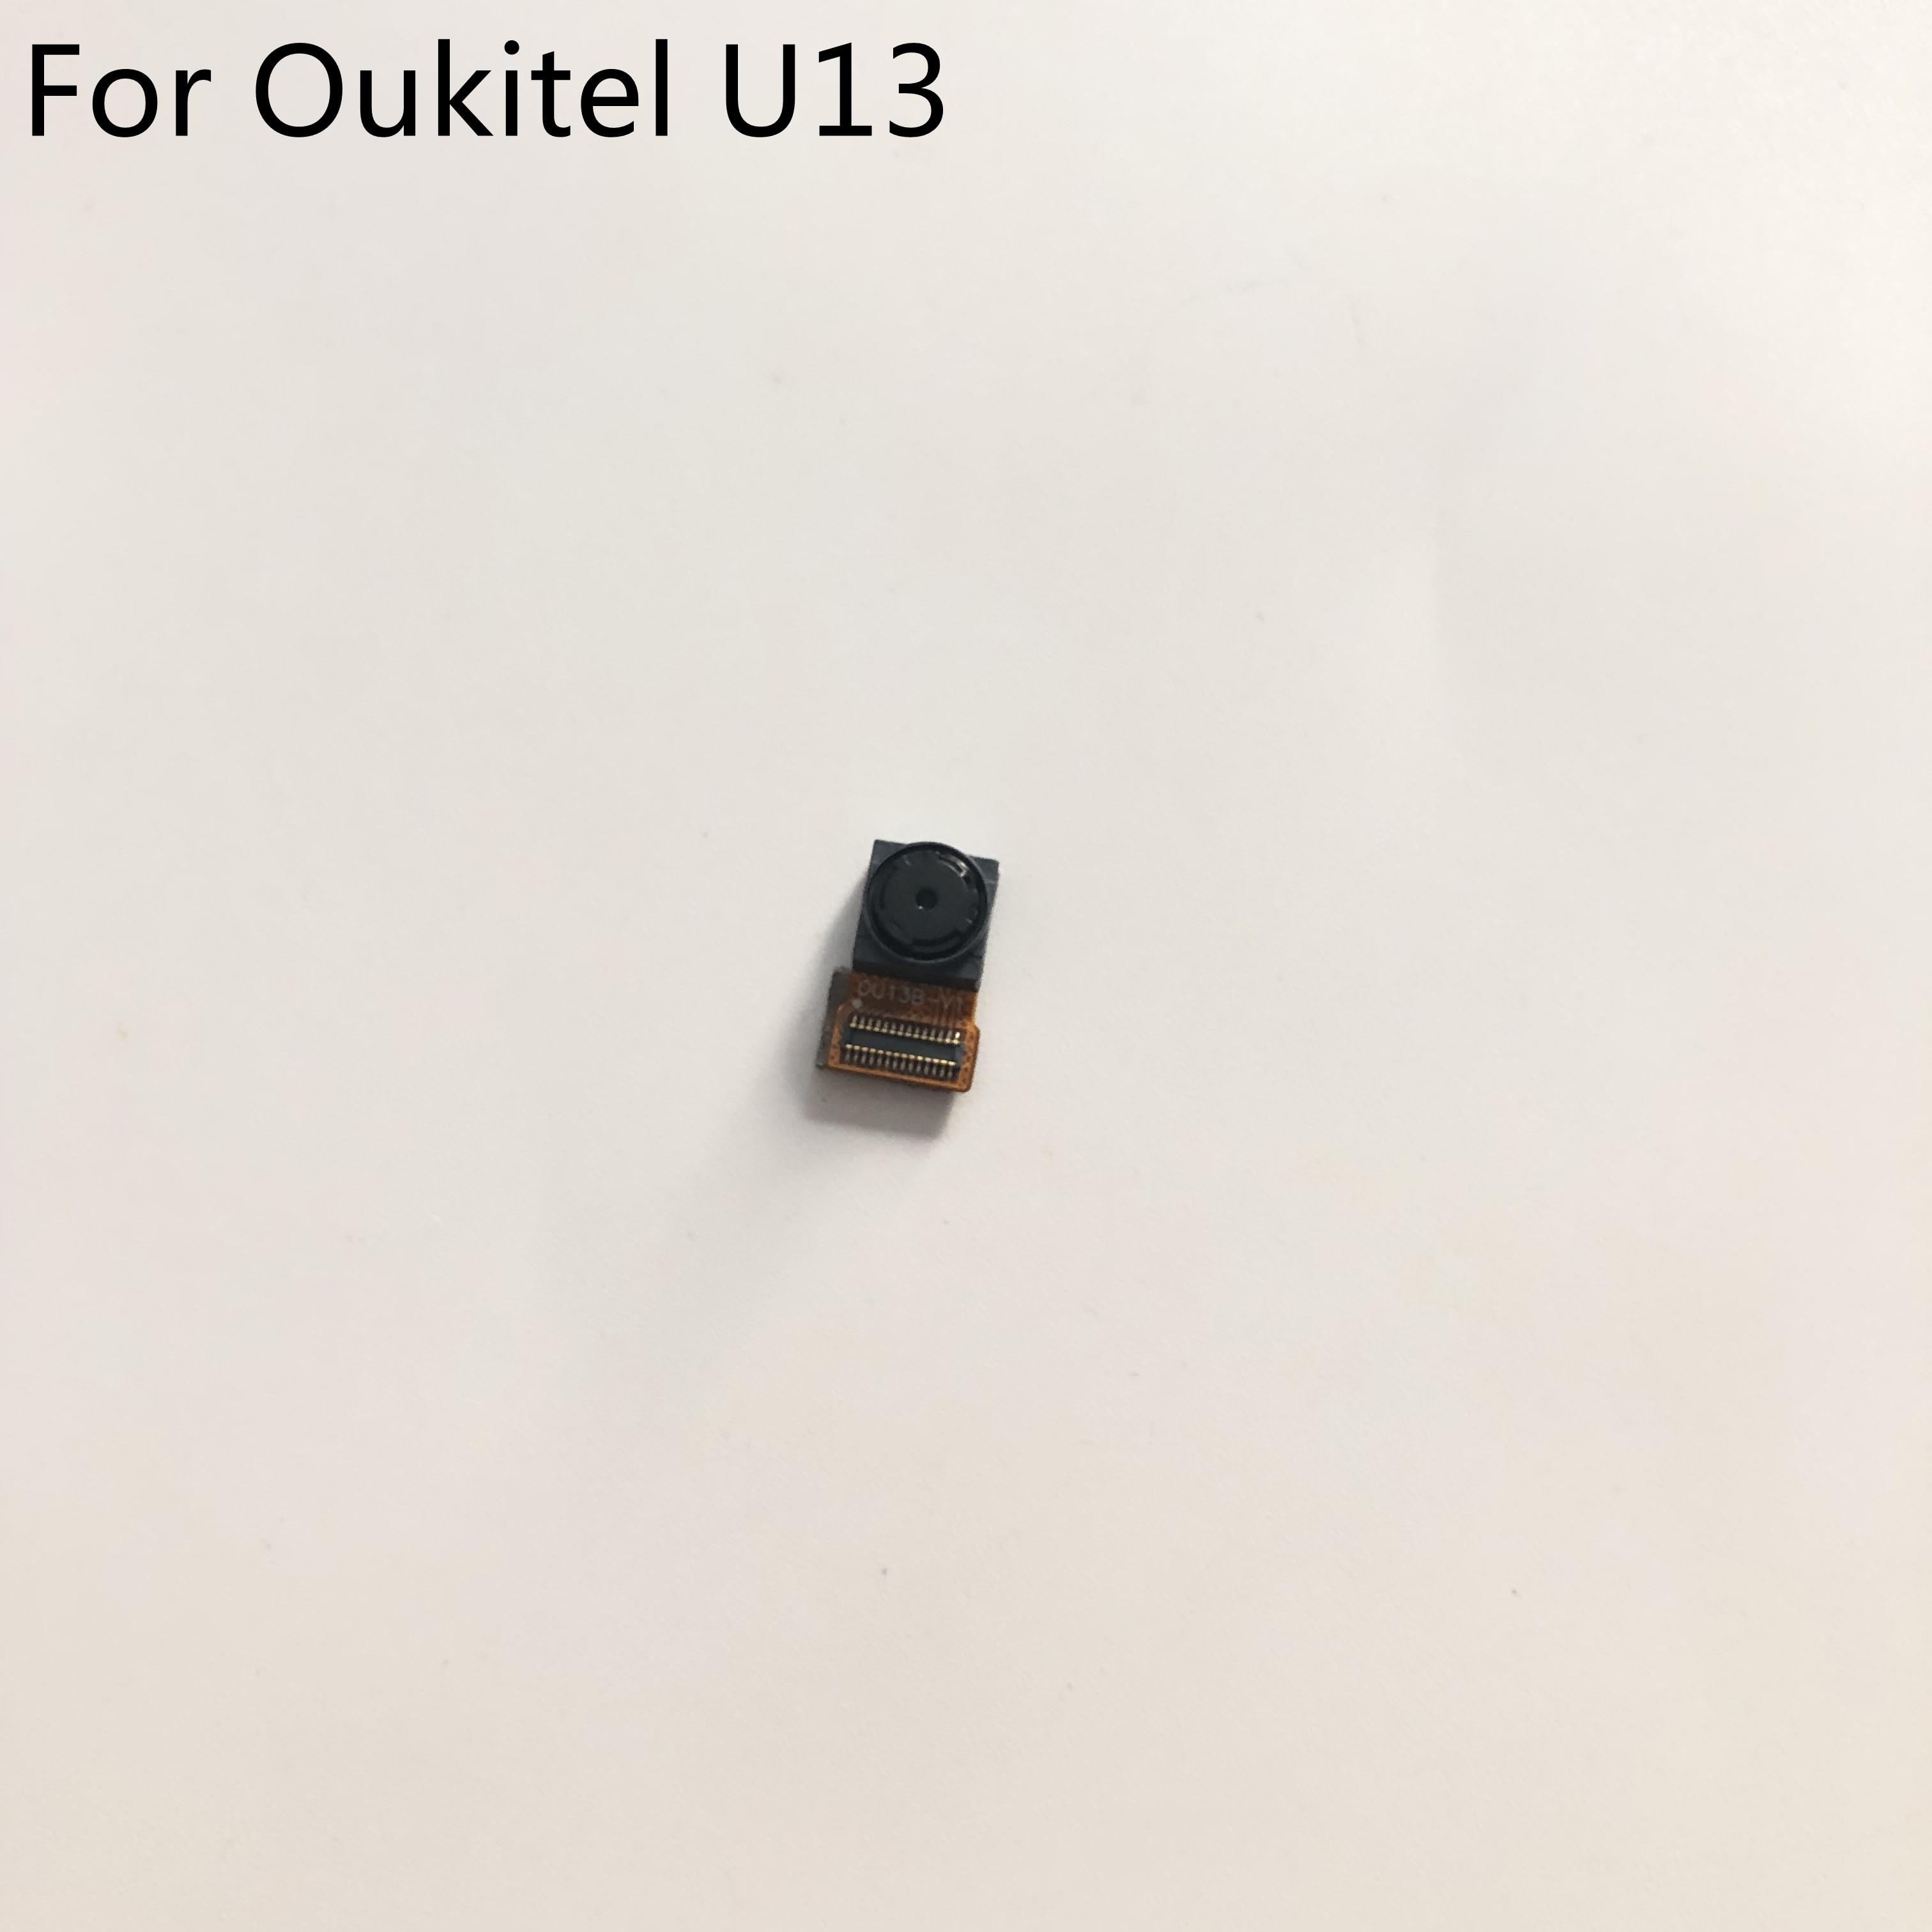 Usado câmera frontal 8.0mp módulo para oukitel u13 mtk6753 octa-core 5.5 polegada 1920*1080 p smartphone